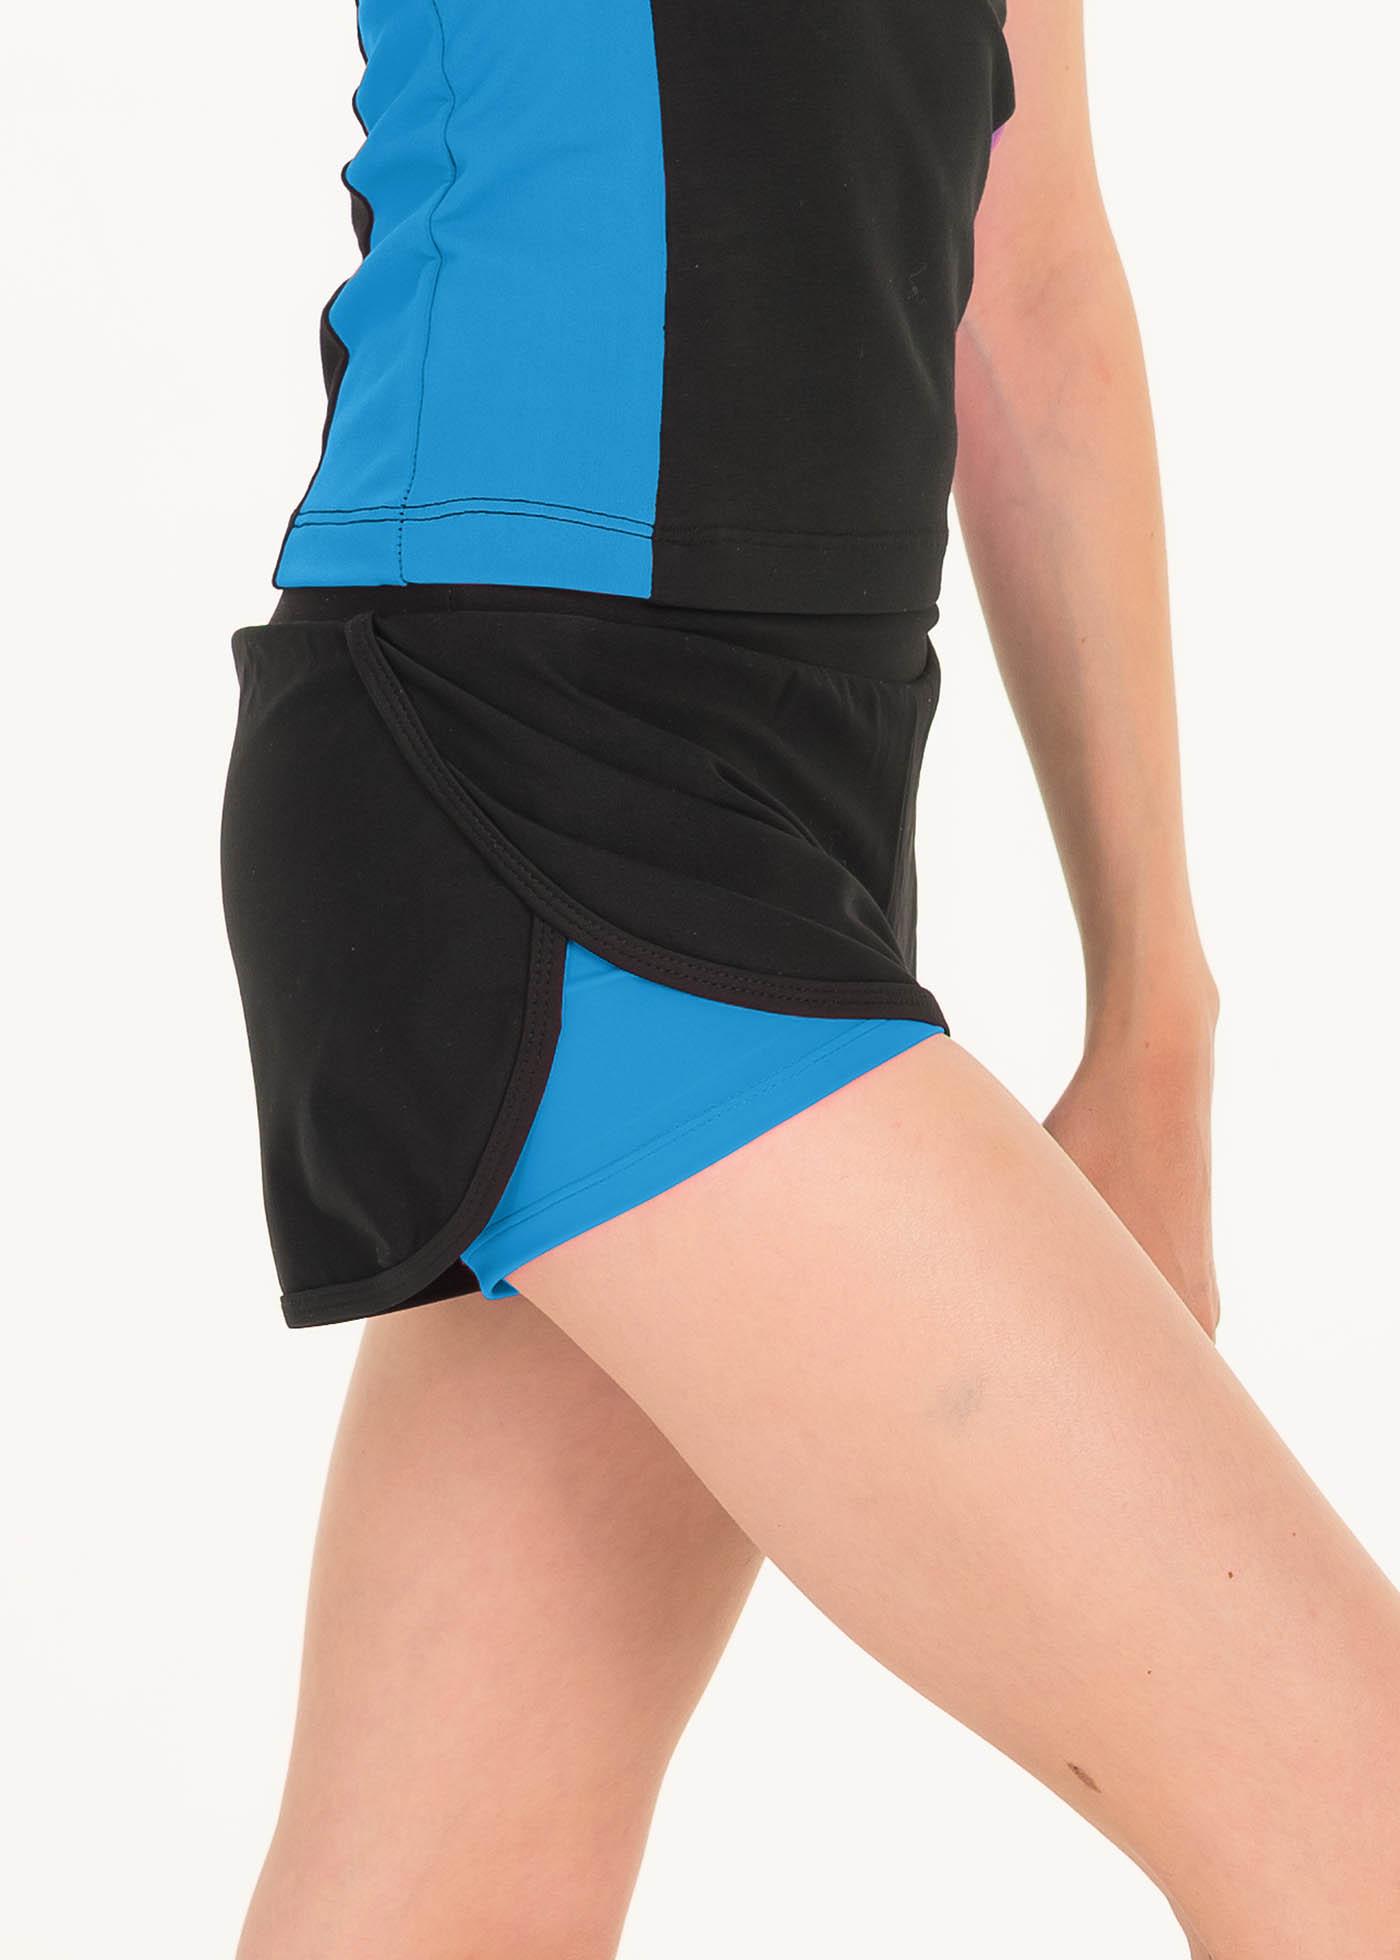 Shorts, Double shorts Gudvin, blue, pic 1